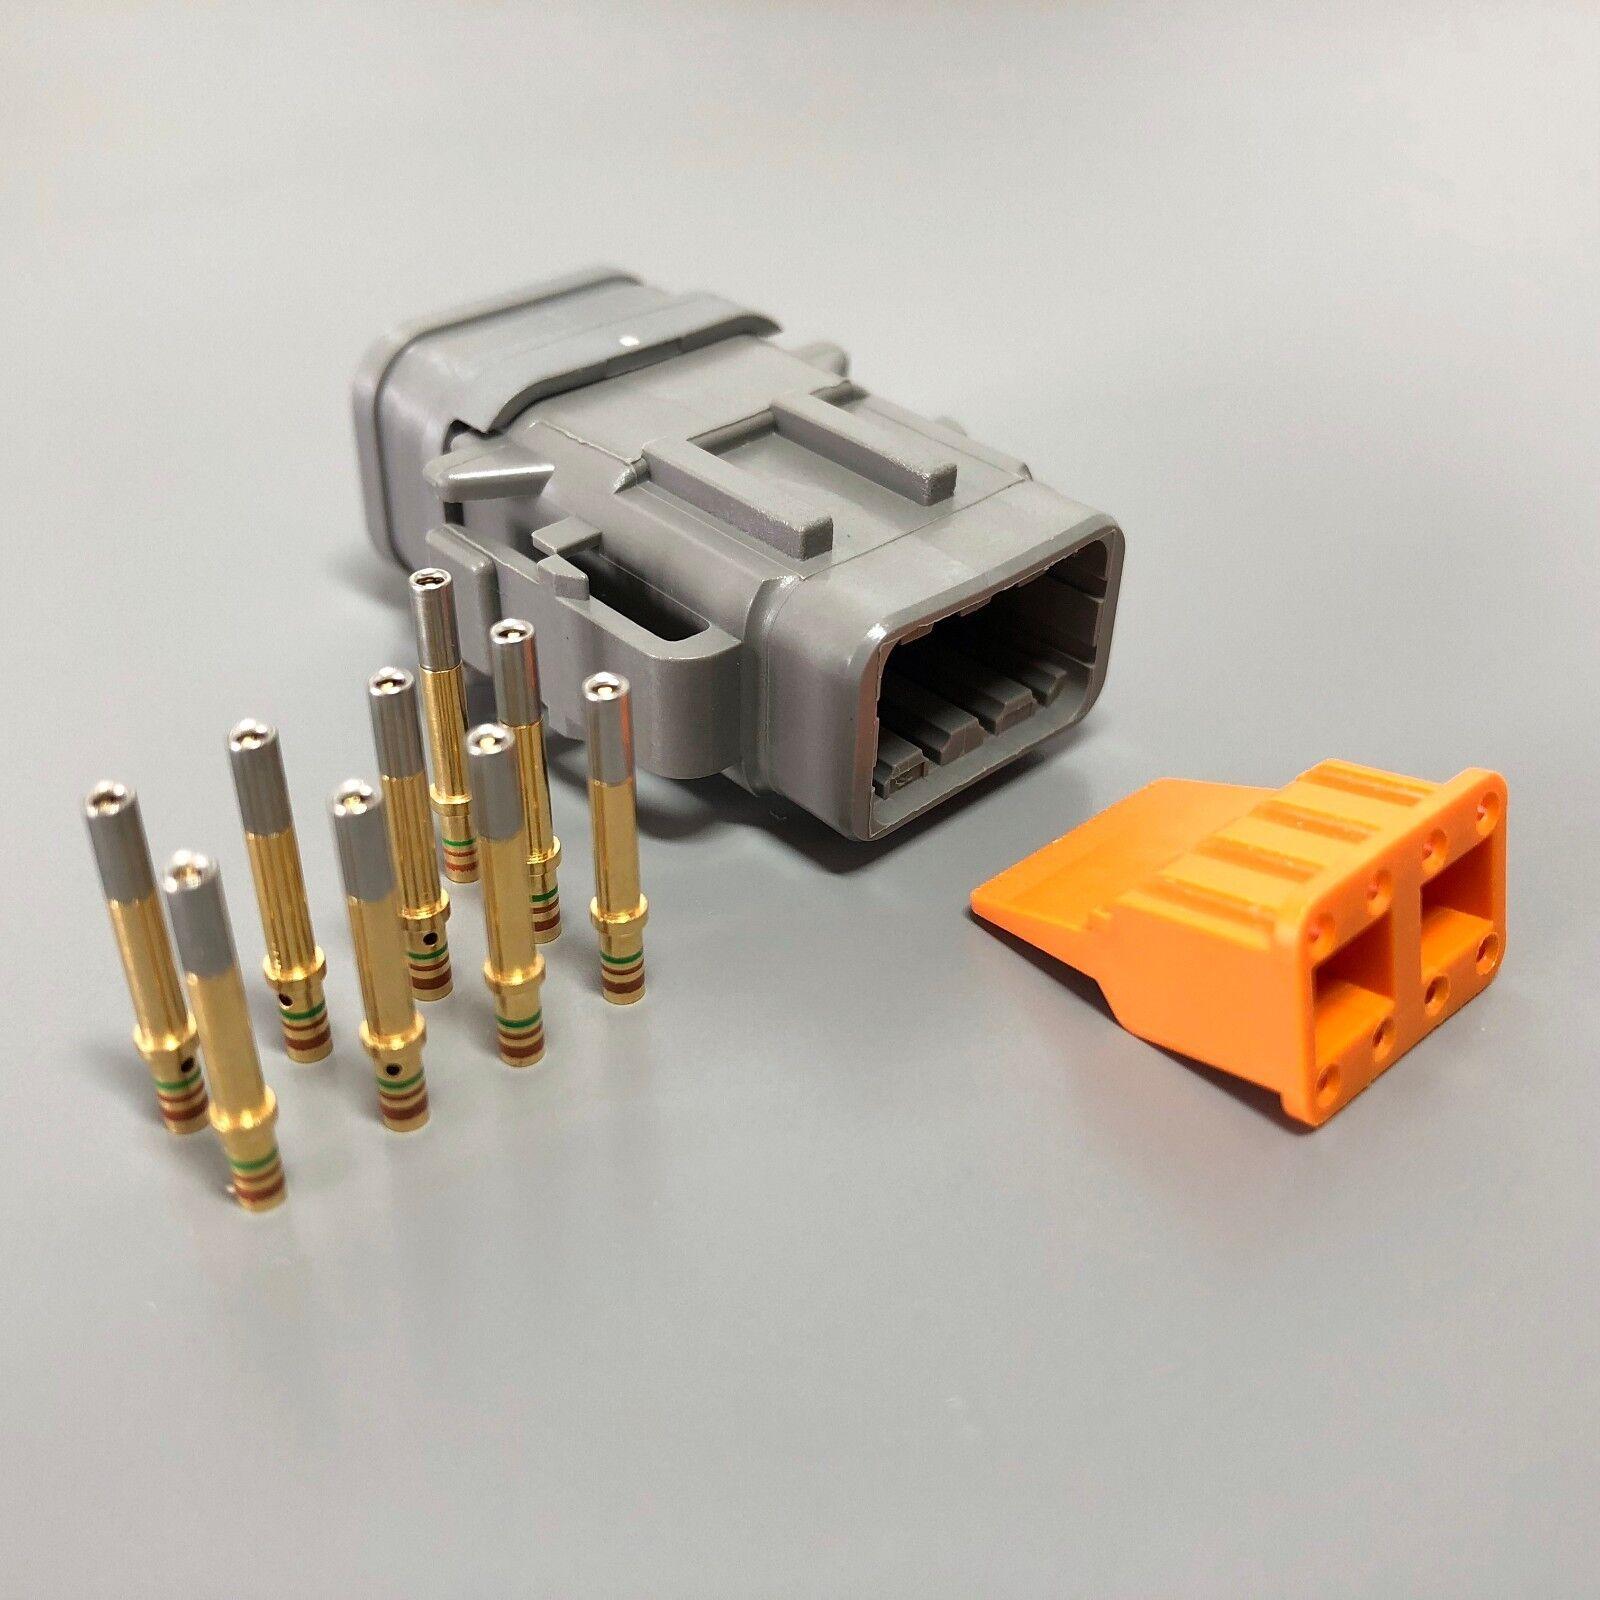 3x Deutsch DTM 8-Way Socket Connector Kit 24-20 AWG Gold Contact Plug DTM06-8S